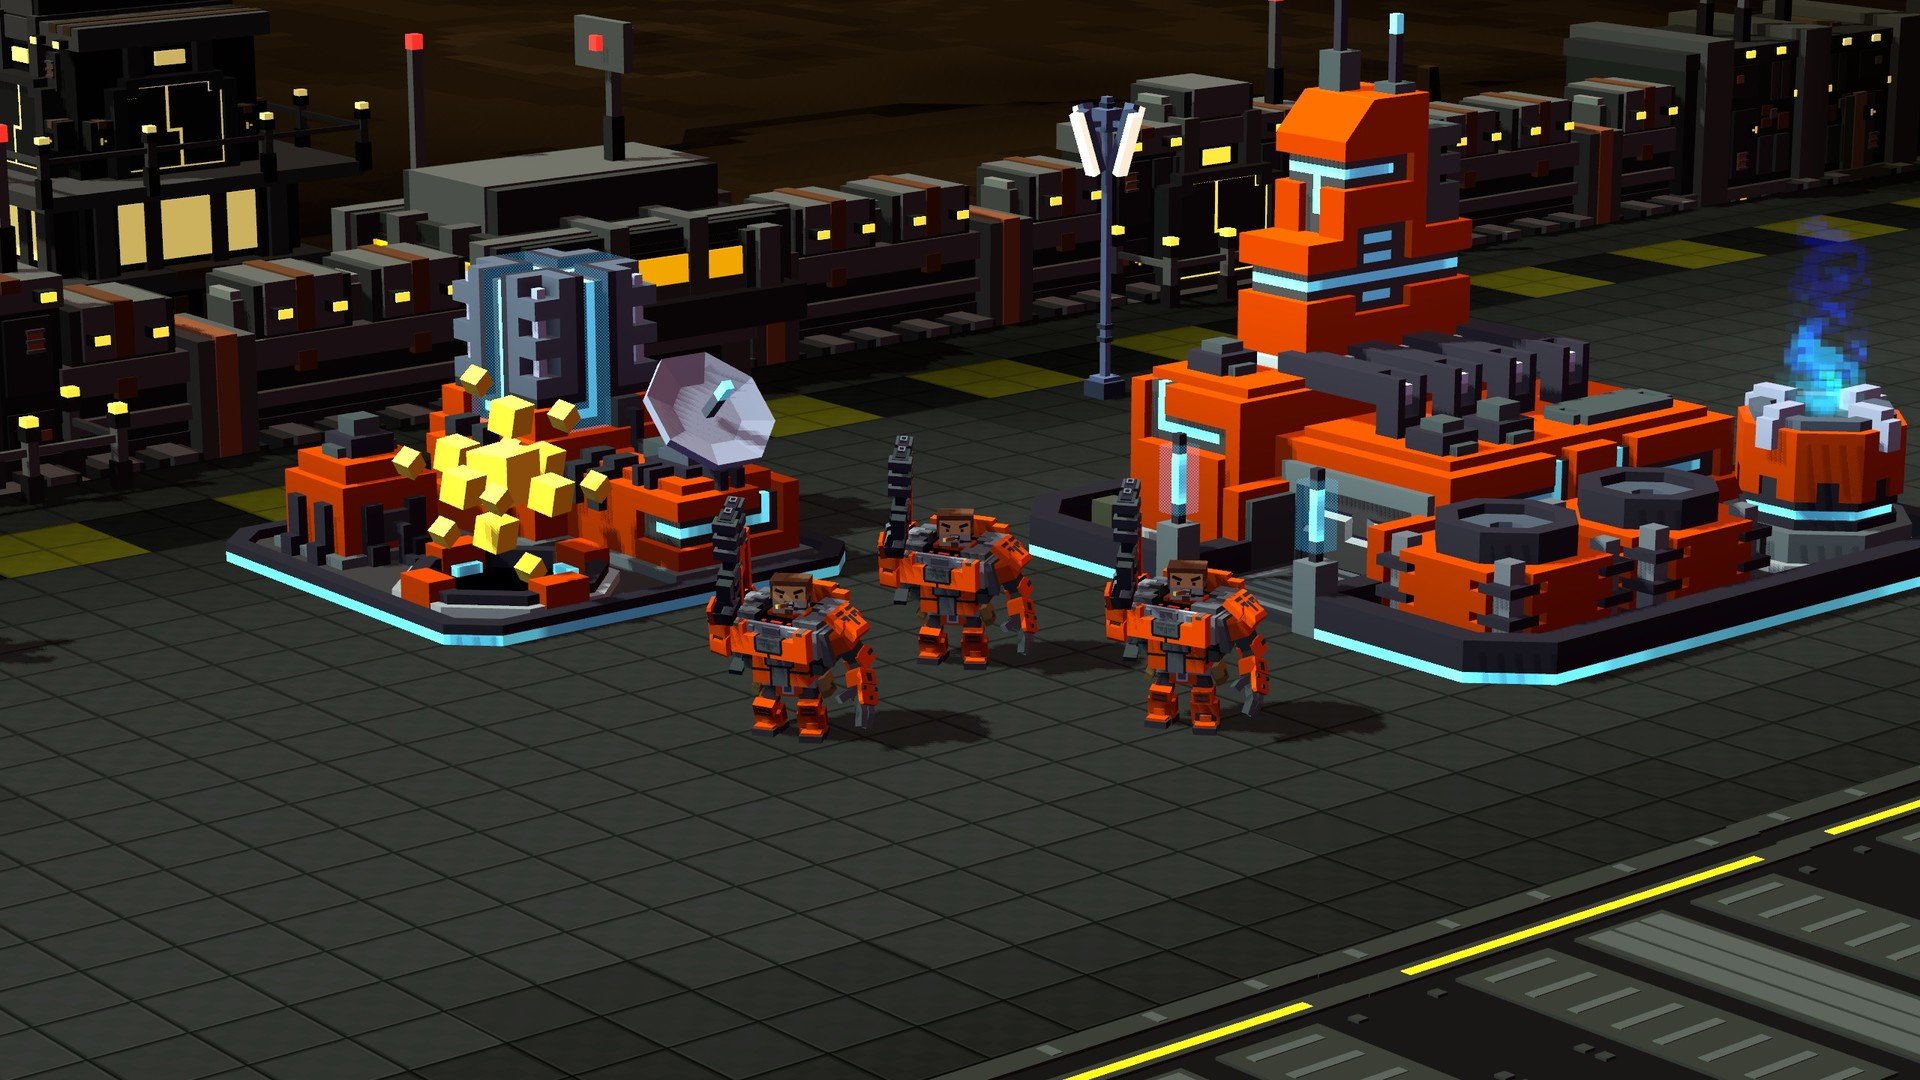 8 Bit Invaders Screenshot 2